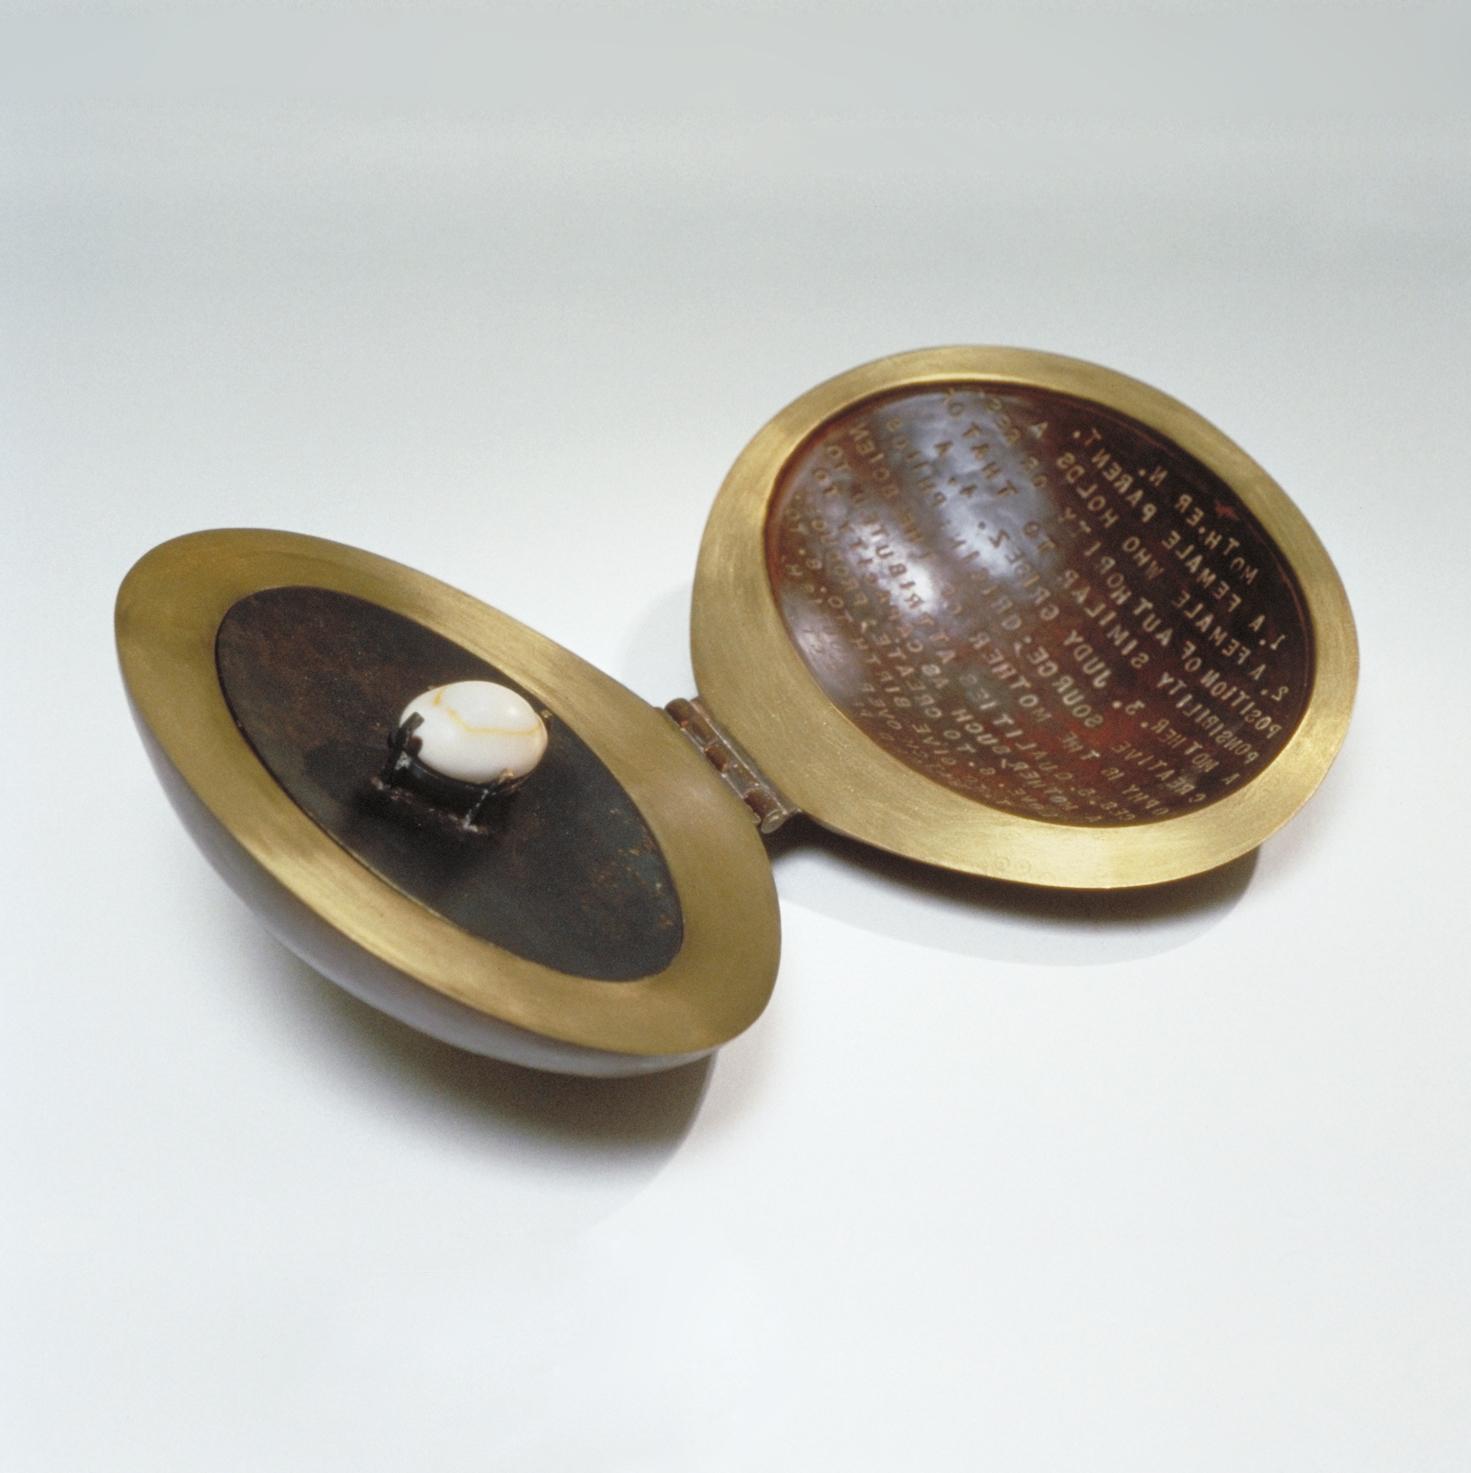 cowry-shell-box-open_CG-Sculpture-Jewelry.jpg